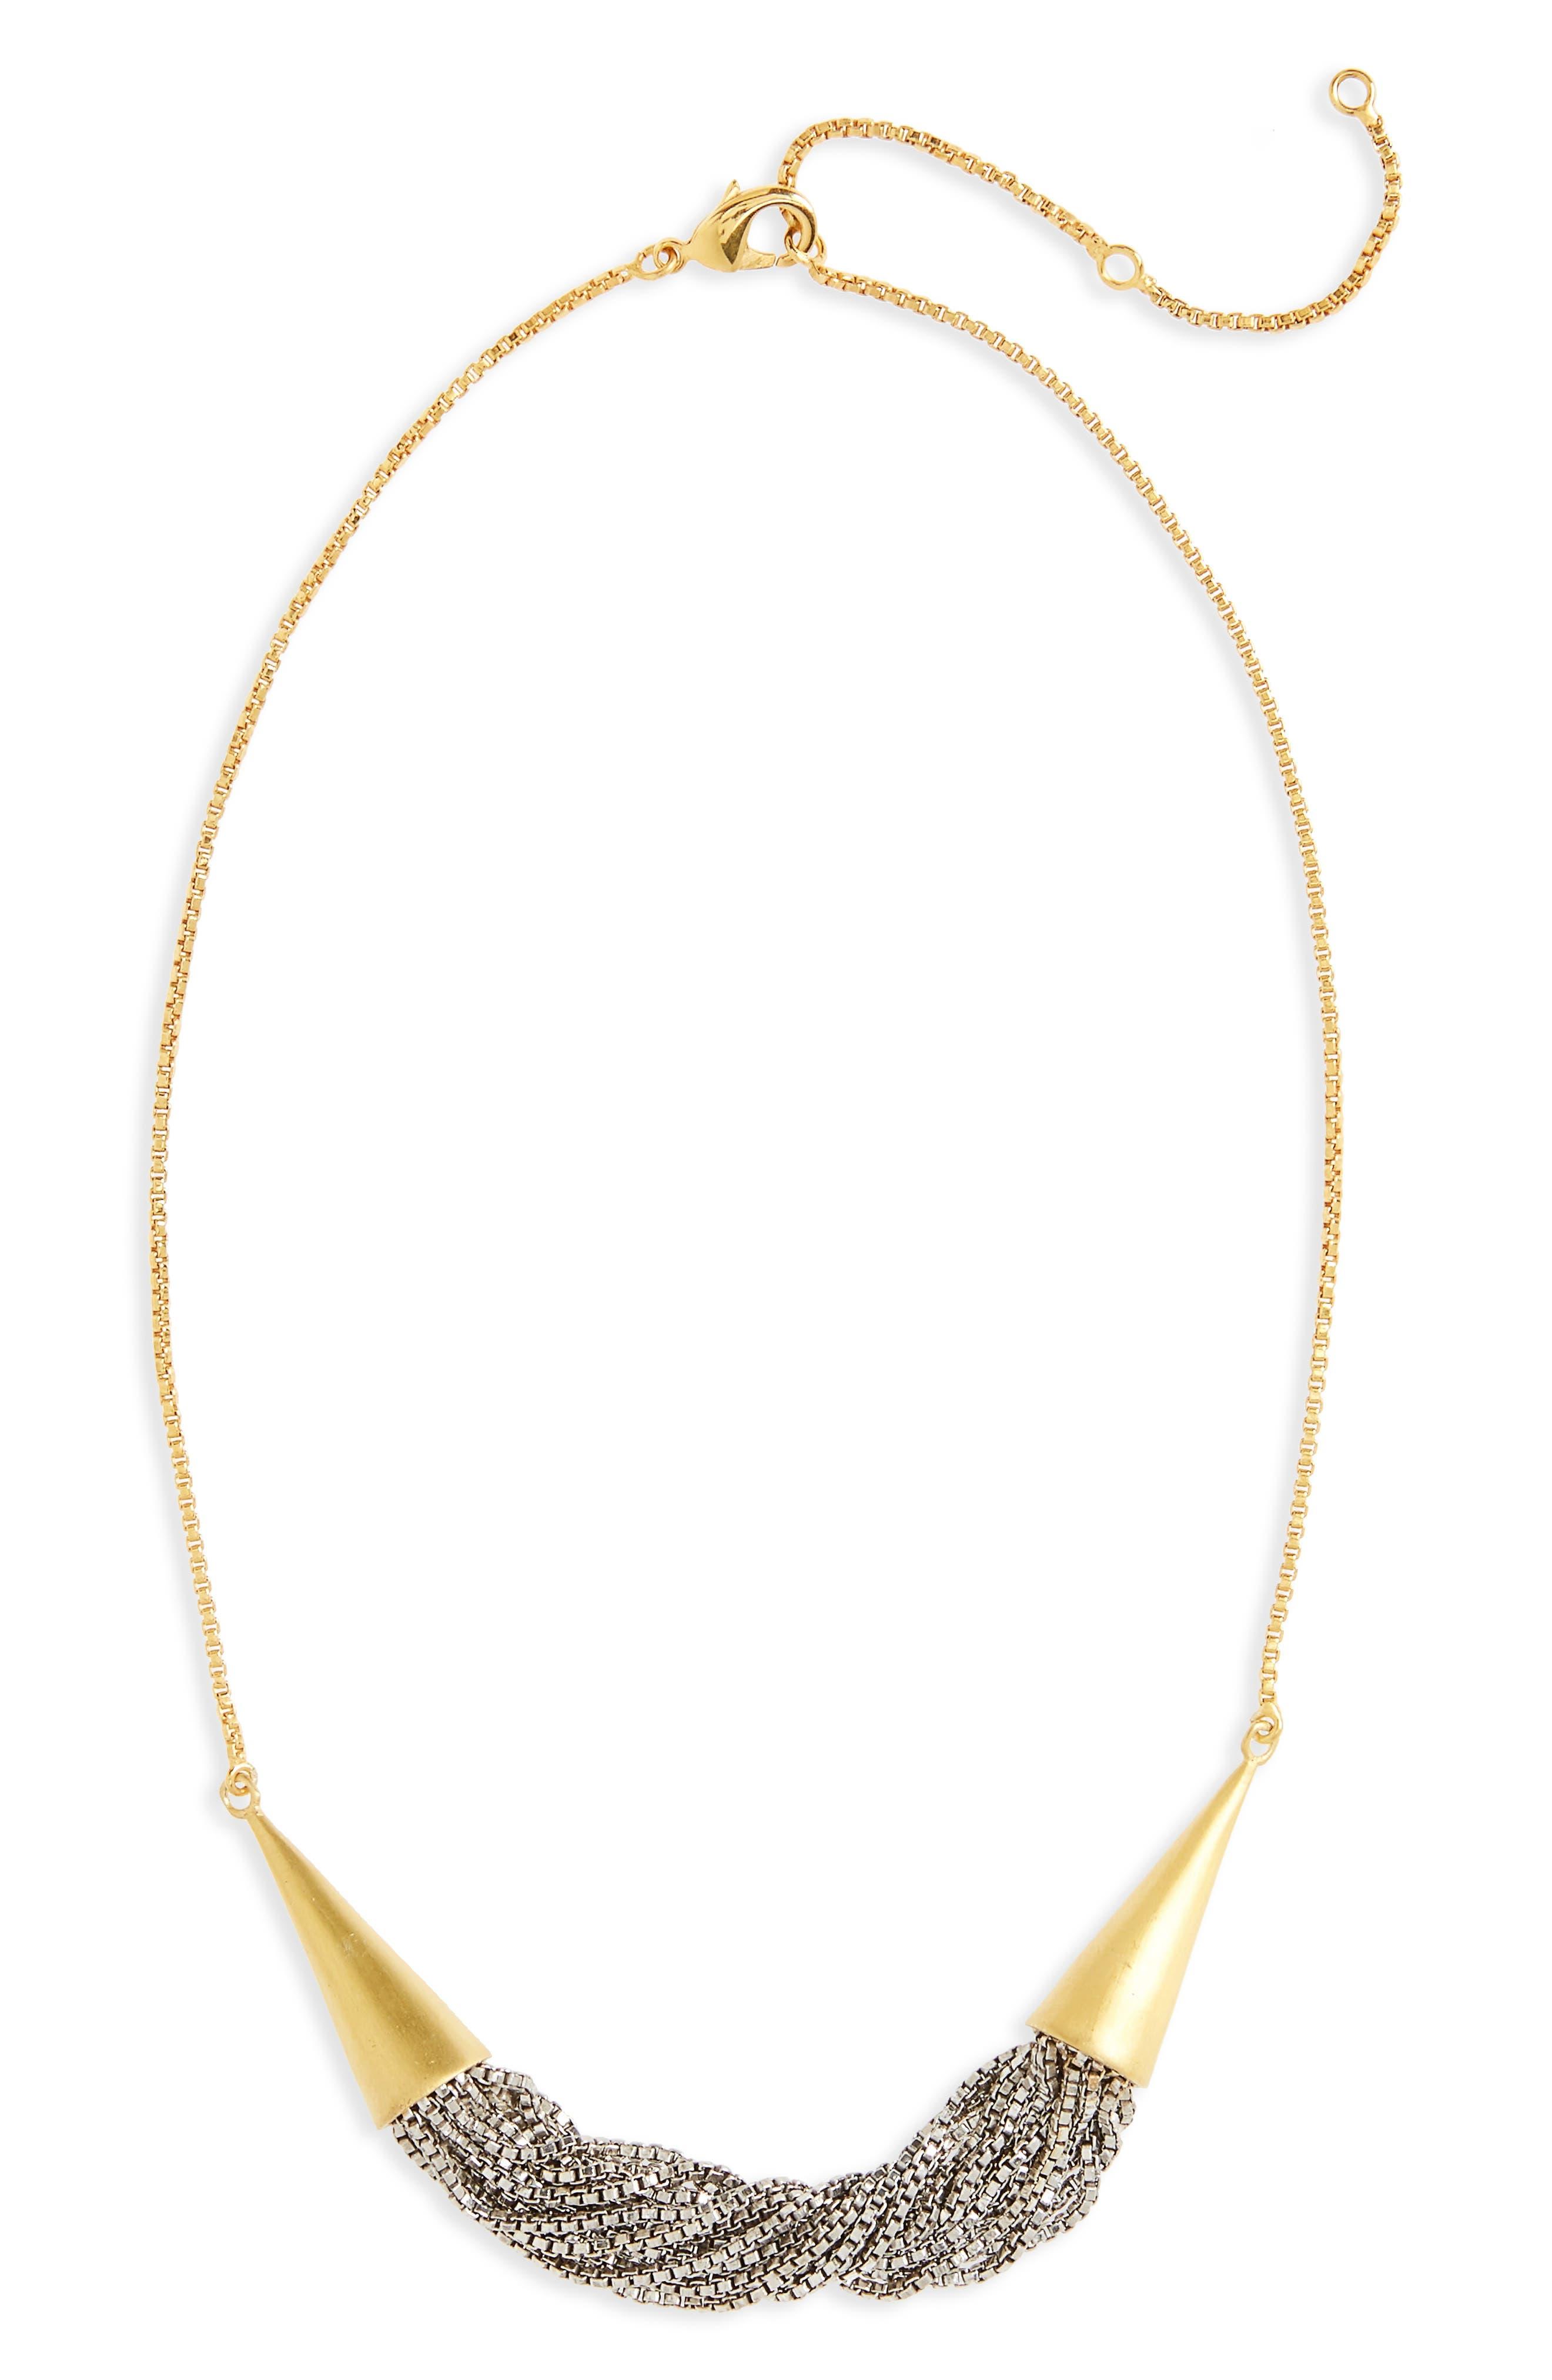 Main Image - Dean Davidson Liquid Chain Collar Necklace